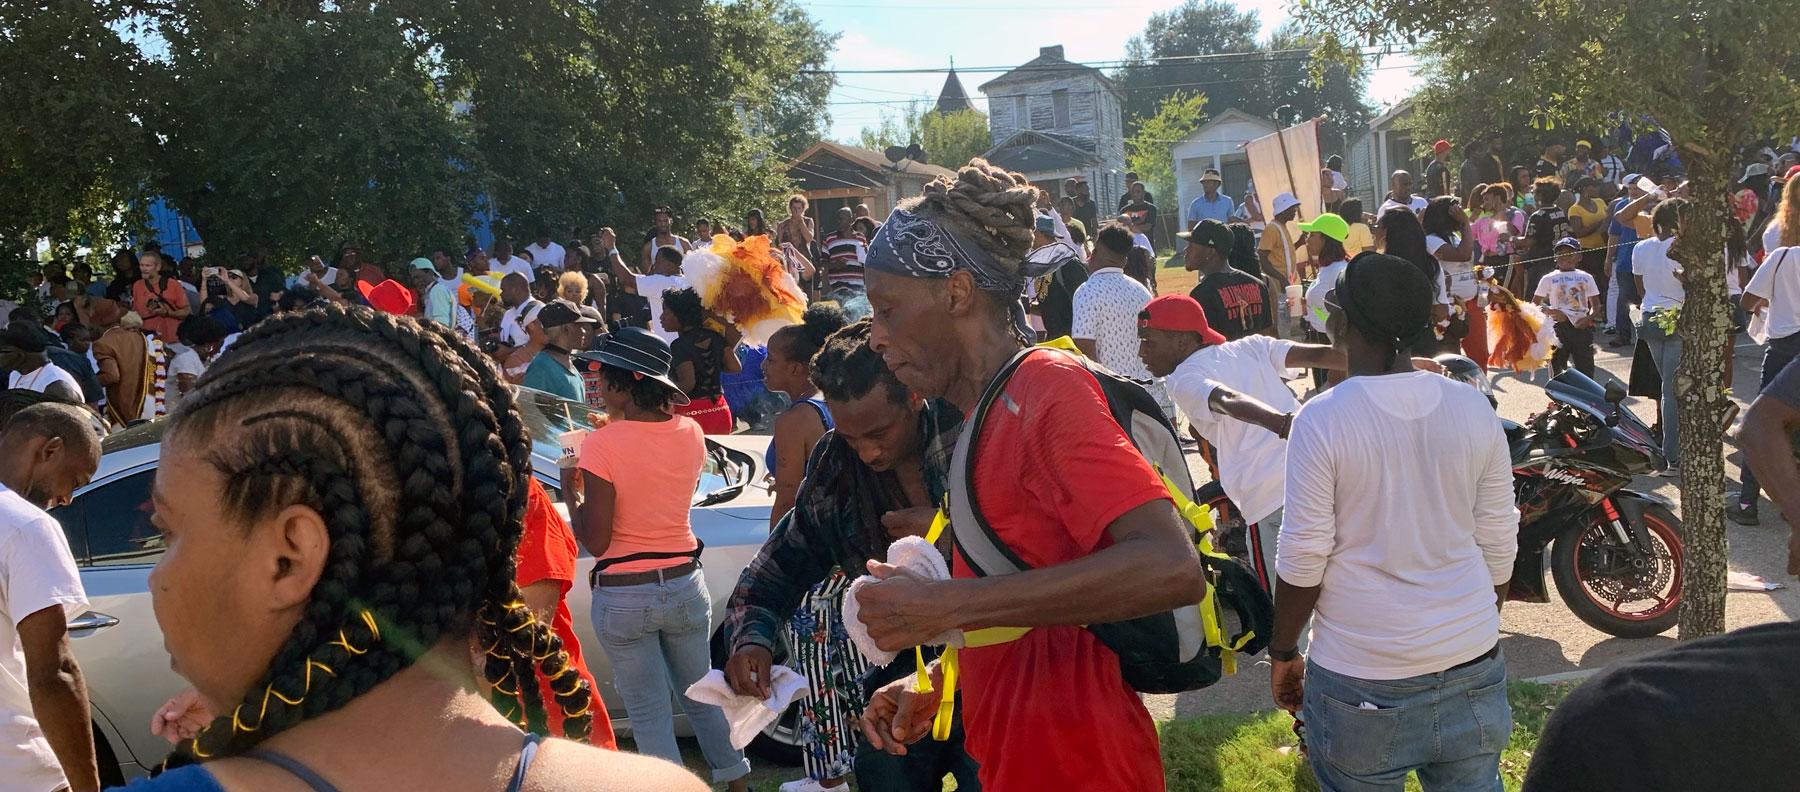 Master PやJuvenileの故郷で体験した衝撃のニューオリンズ・セカンド・ライン・パレード!